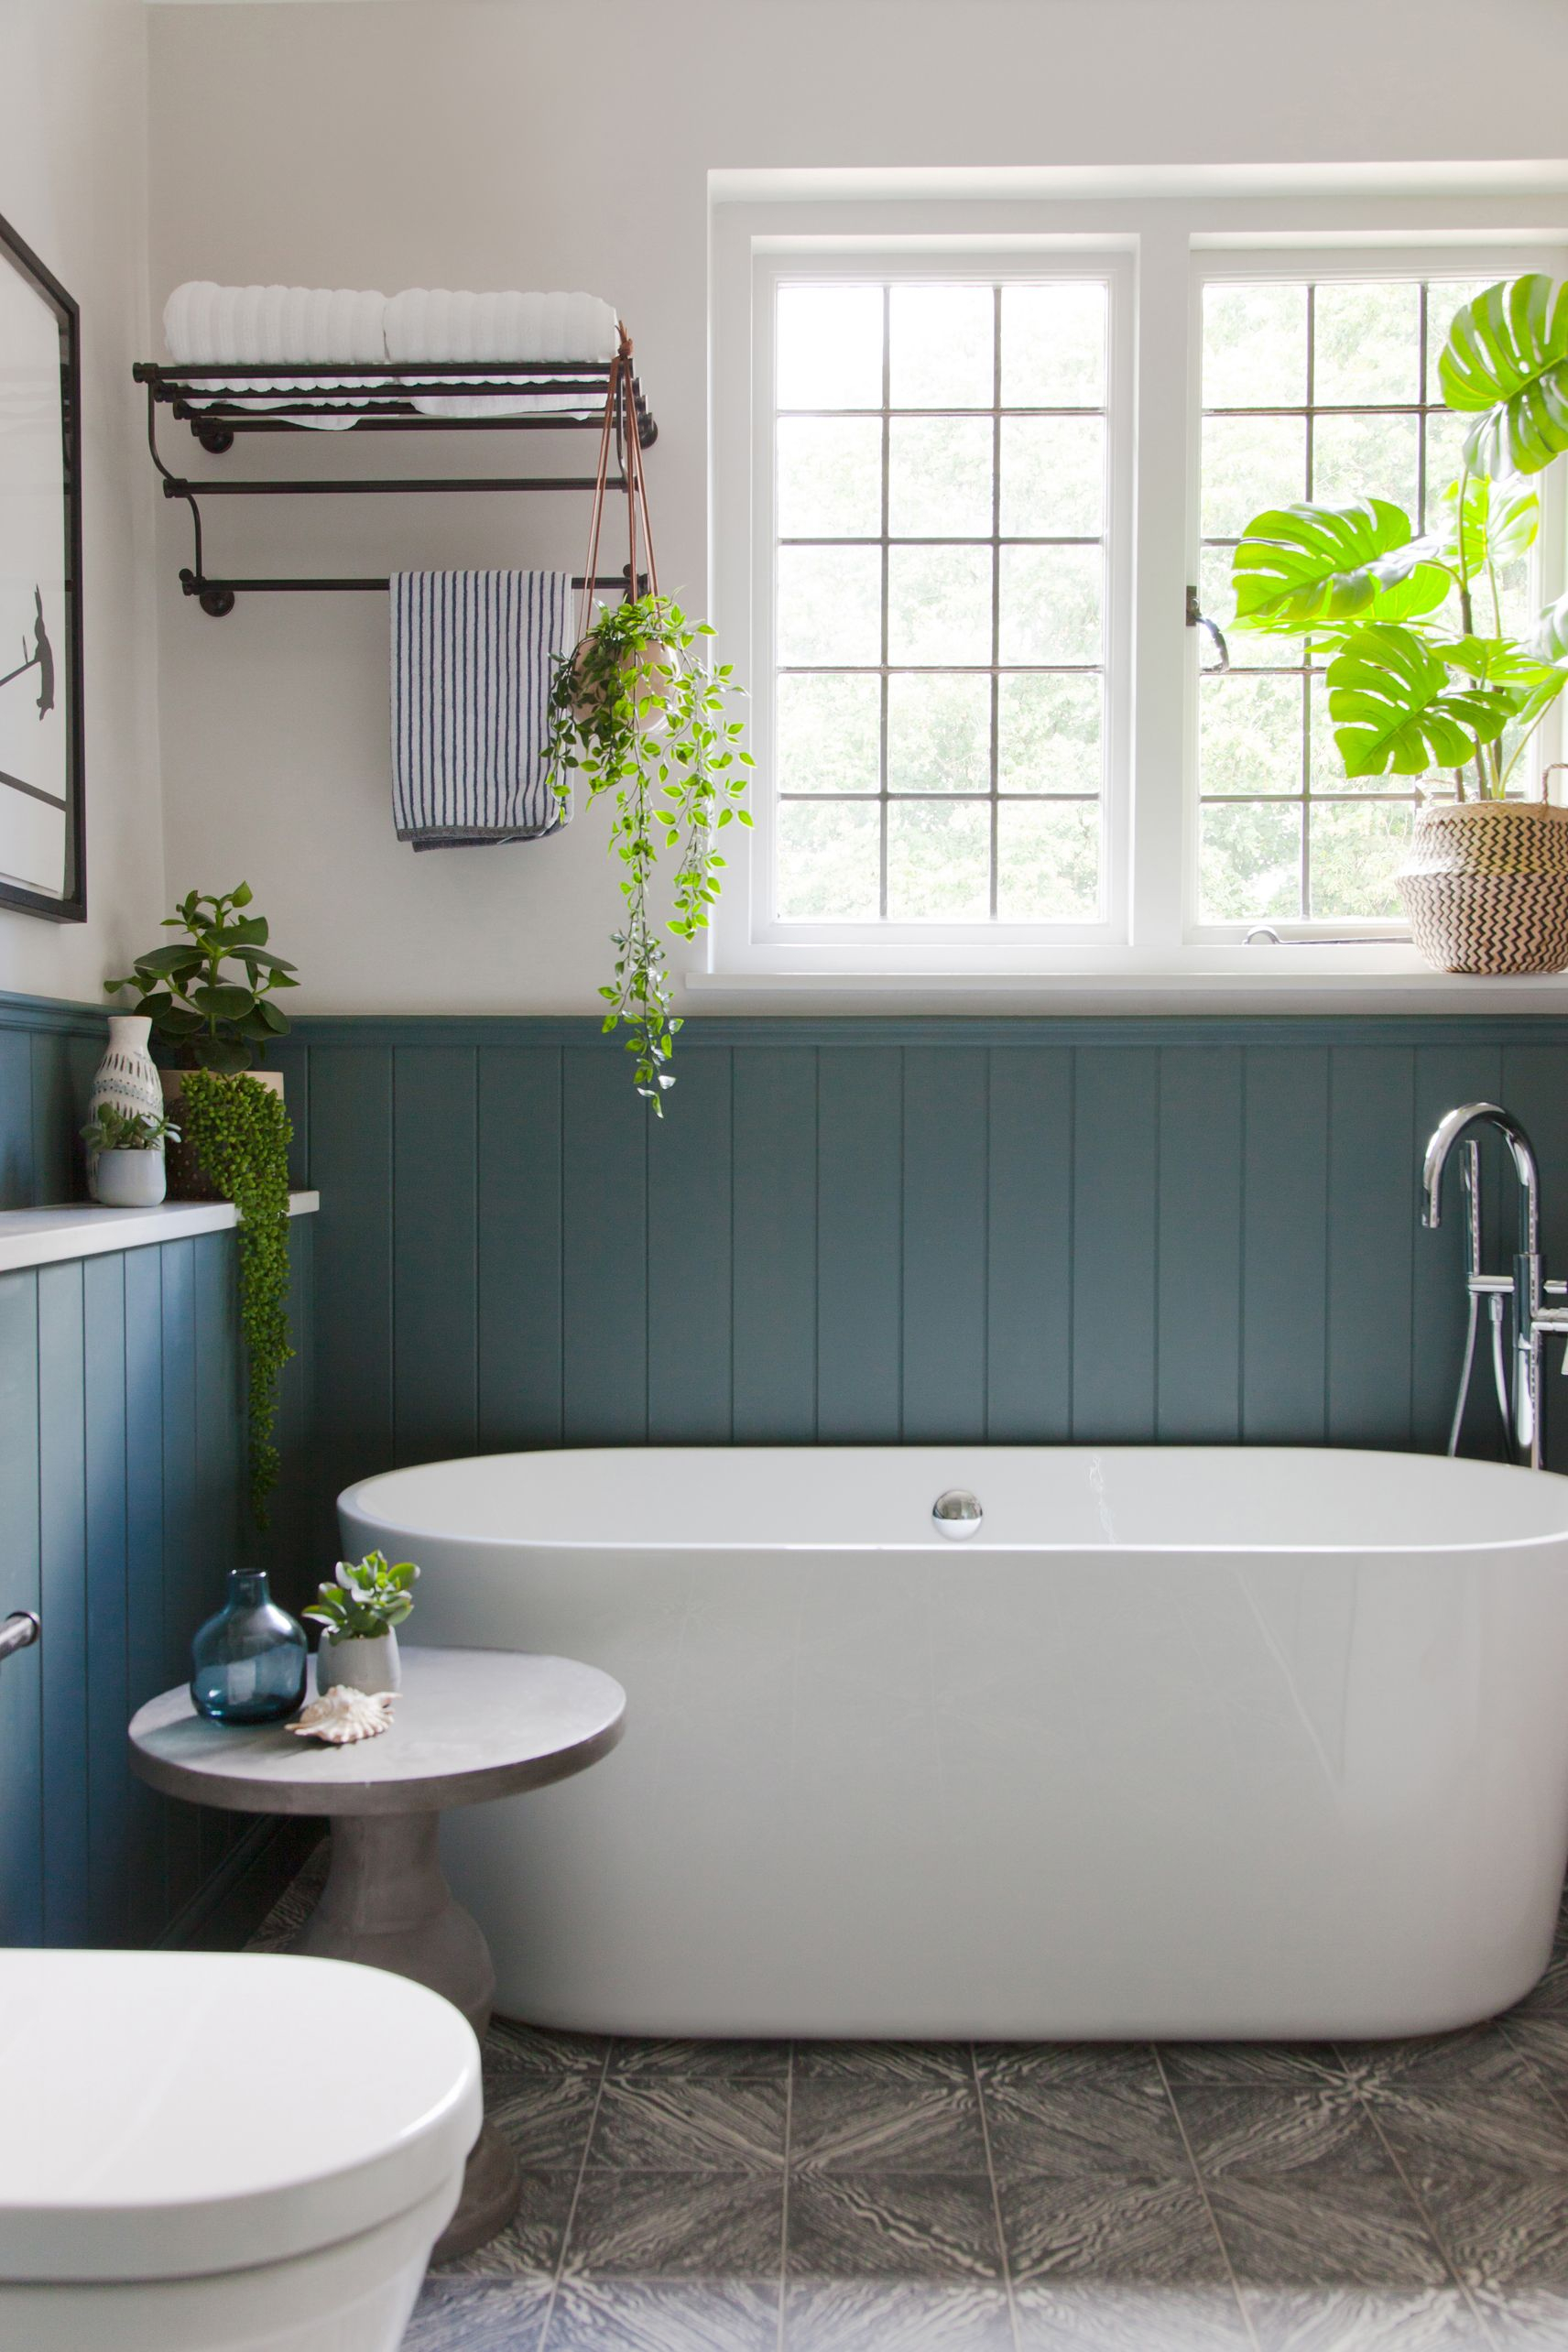 20 Best Bathroom Storage Ideas In 2019 Creative Bathroom throughout size 1712 X 2568